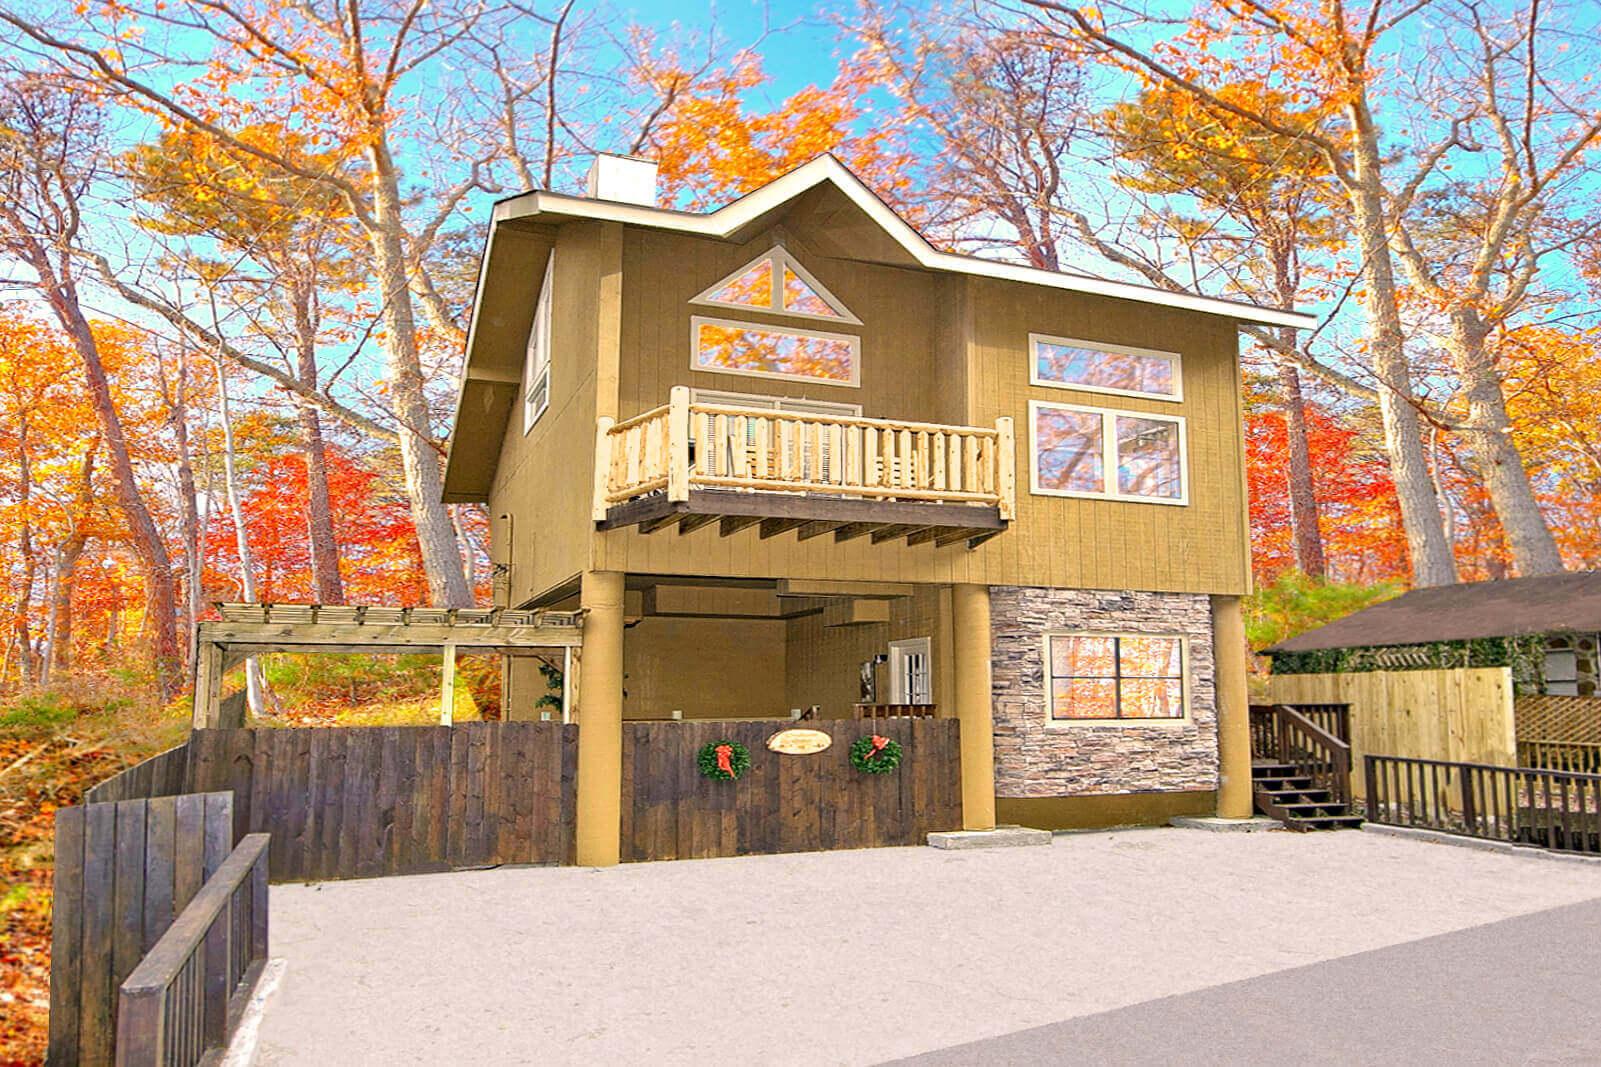 Downtown gatlinburg 1 bedroom cabin on a creek elk springs for Cabins near downtown gatlinburg